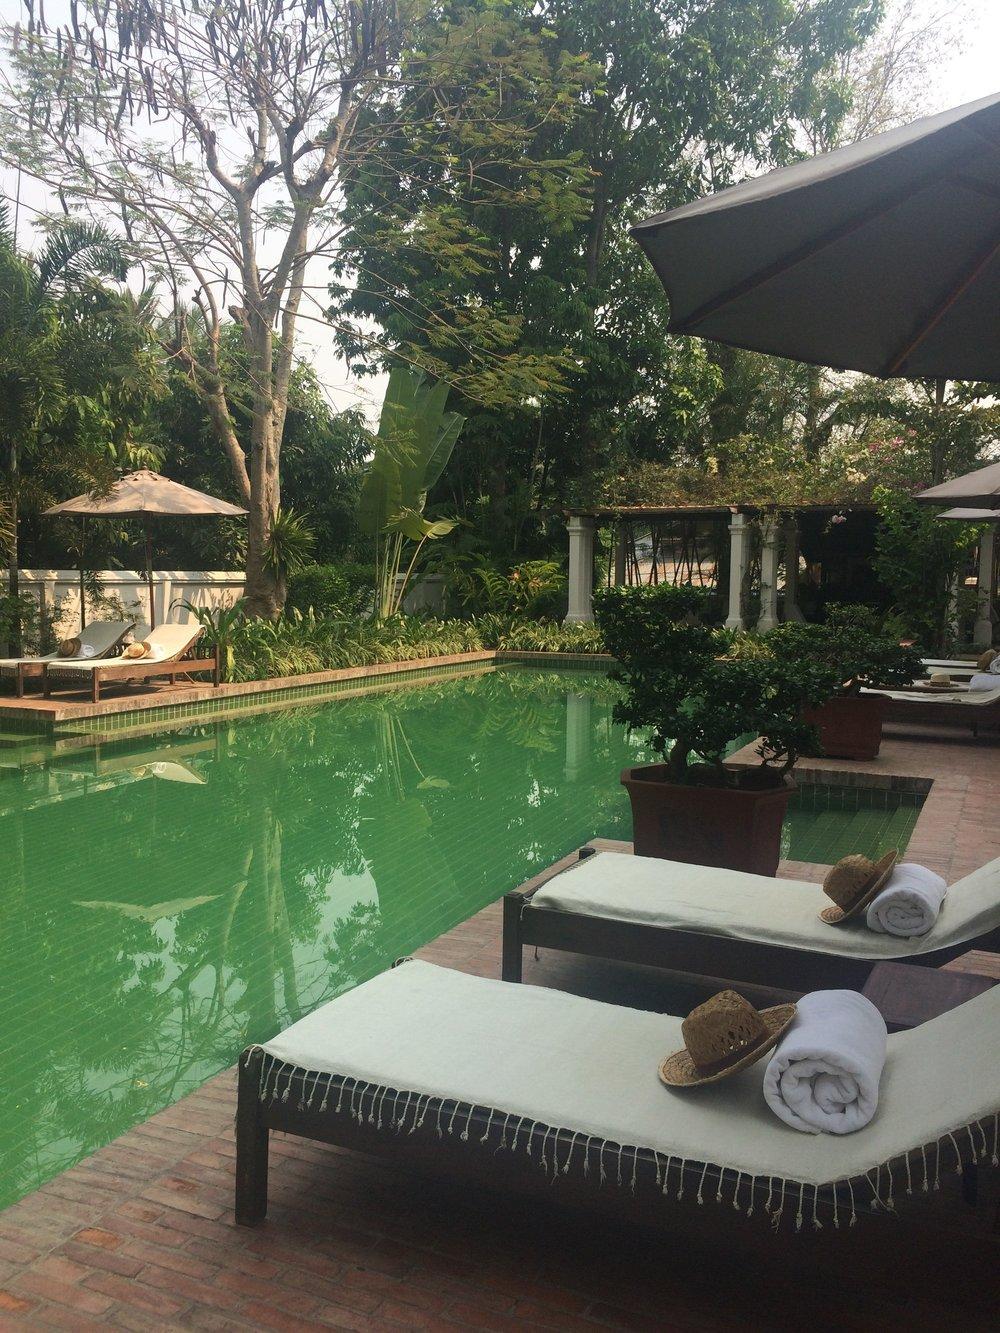 The Satri House pool